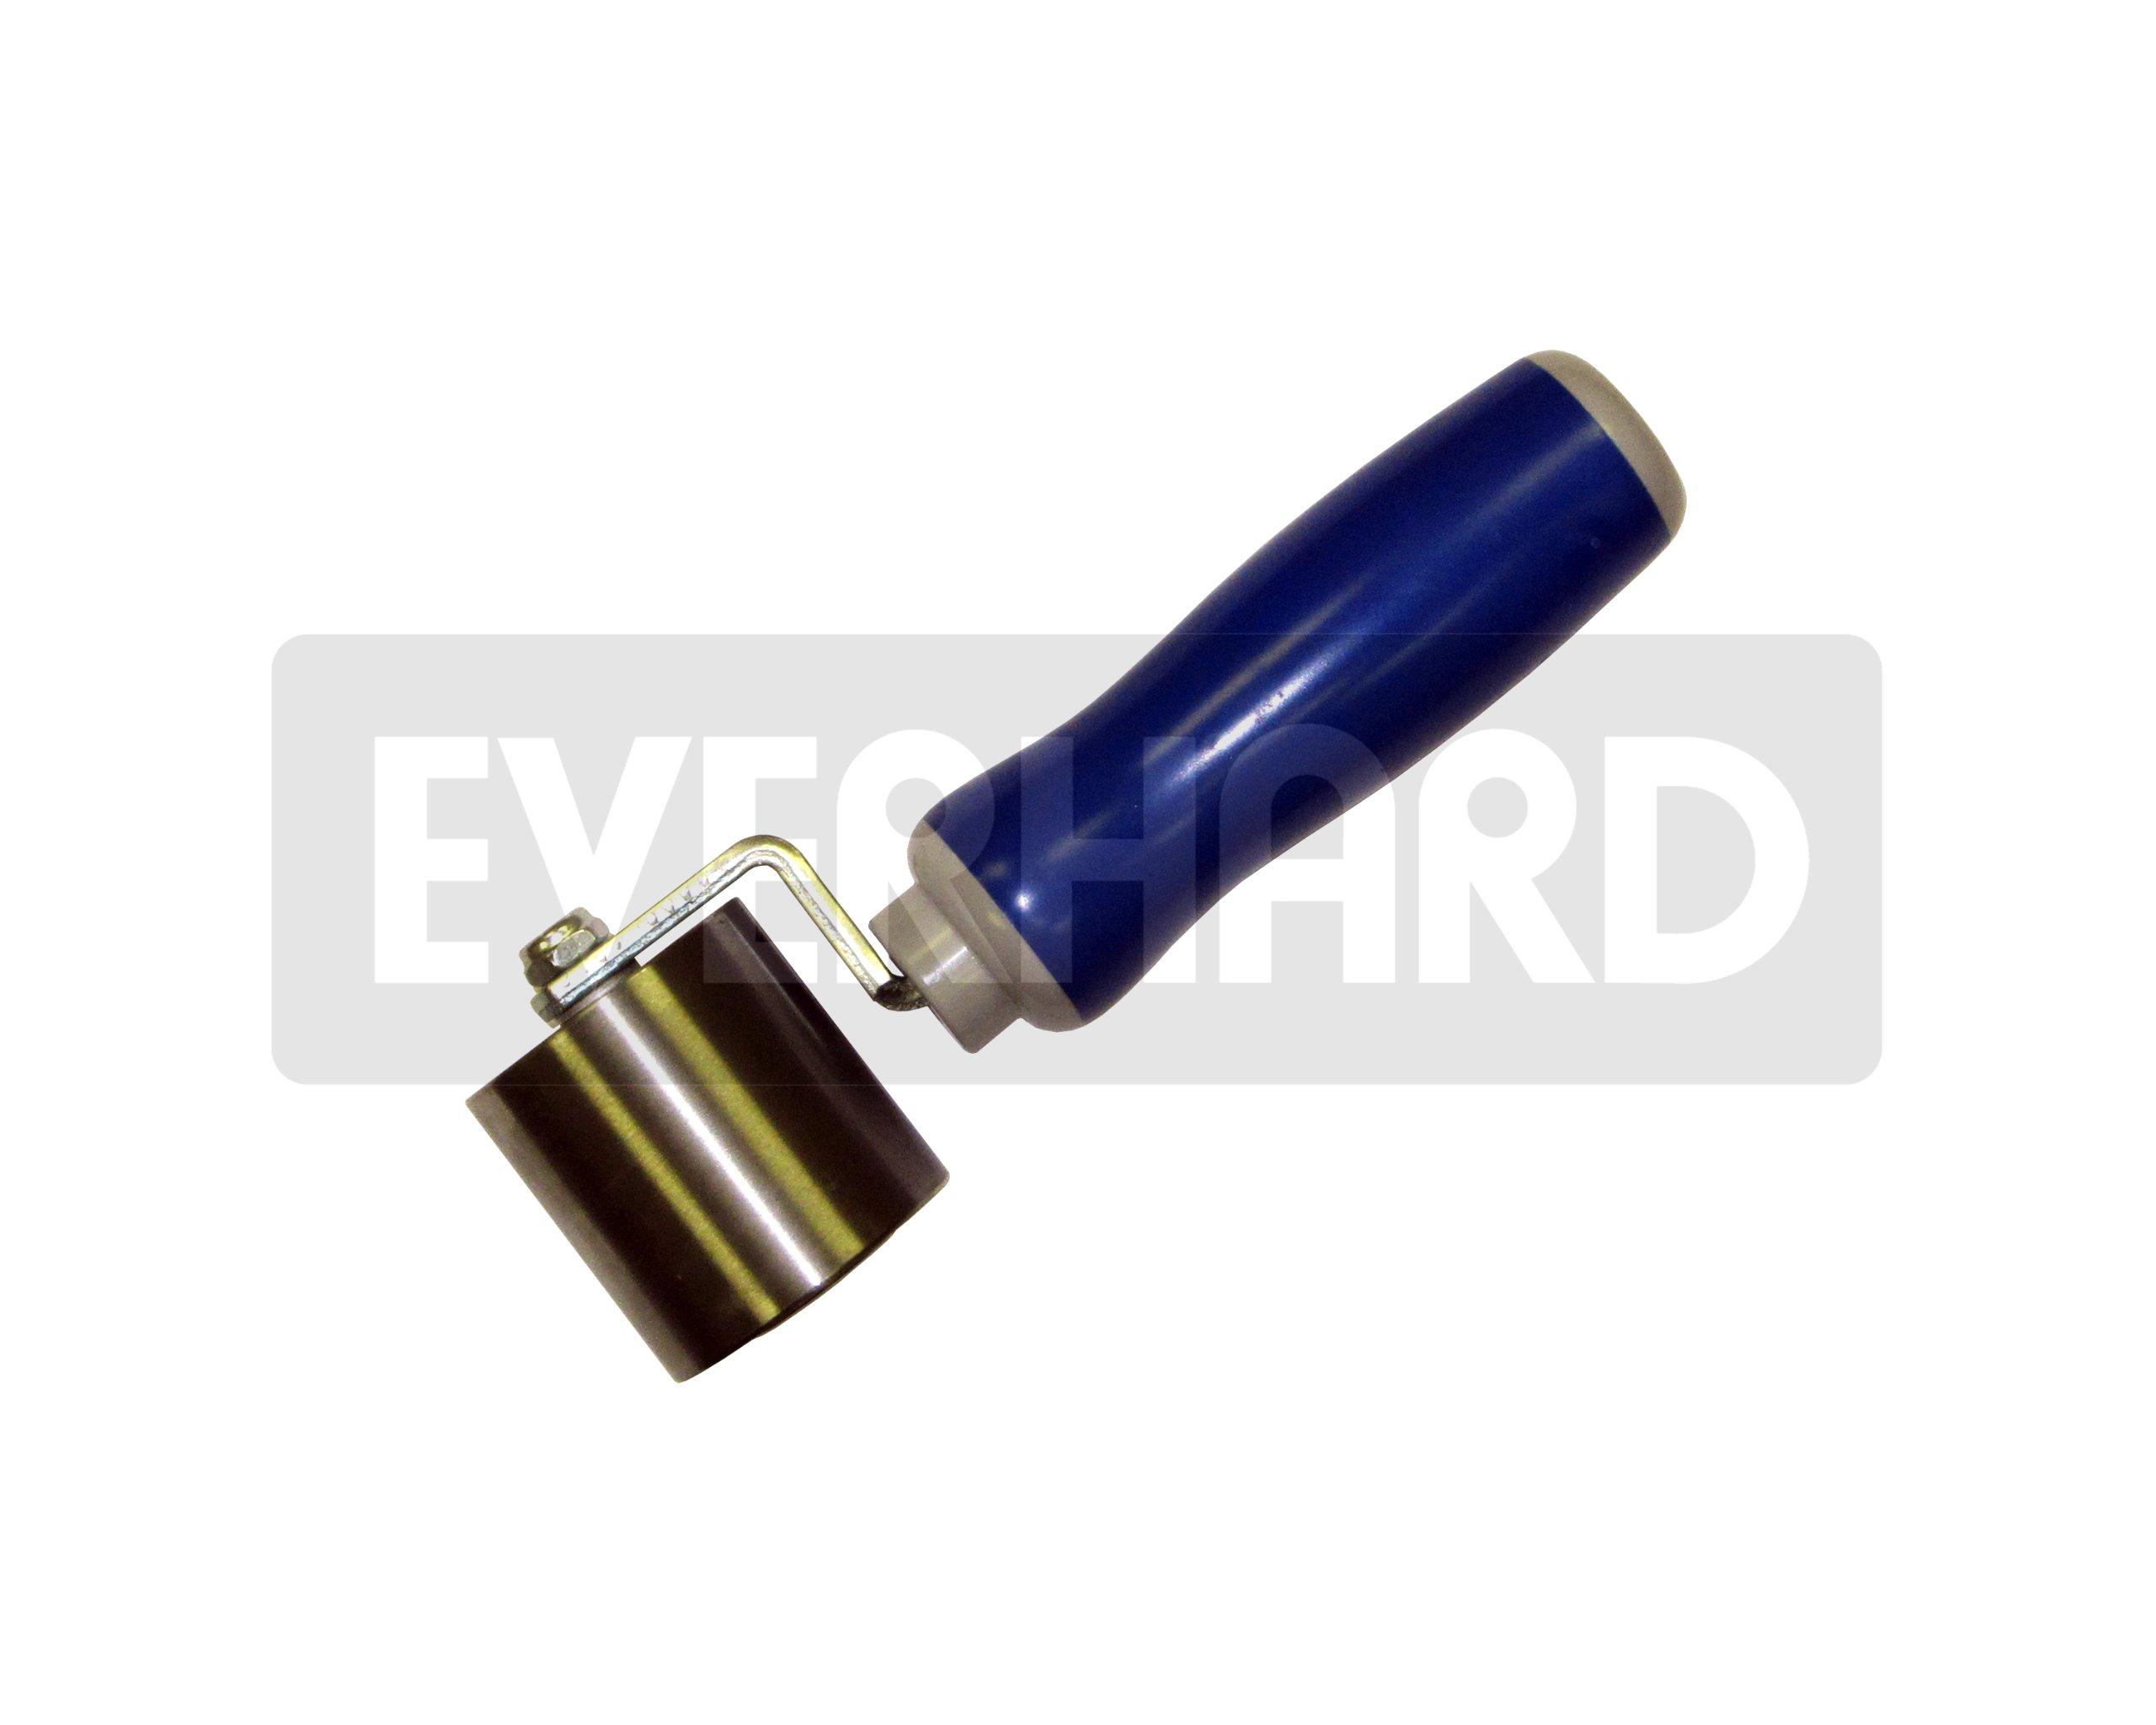 MR02130 Everhard Convertible Steel Seam Roller, 2'' dia. x 2'' wide